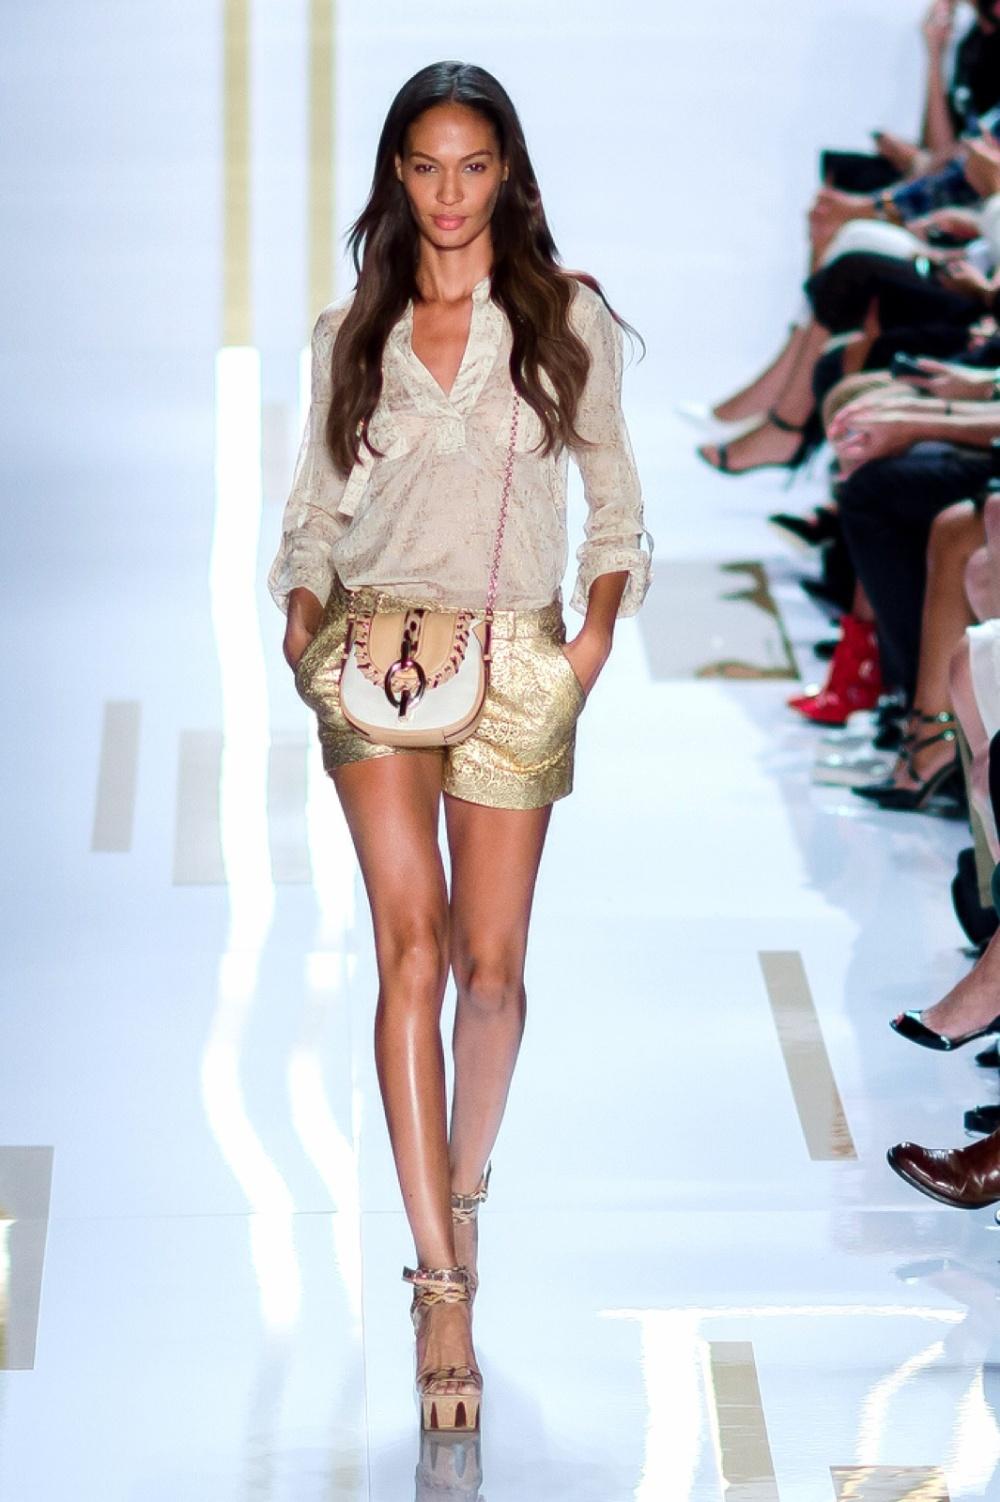 joan_smalls_rodriguez_dvf_runway_ss_14